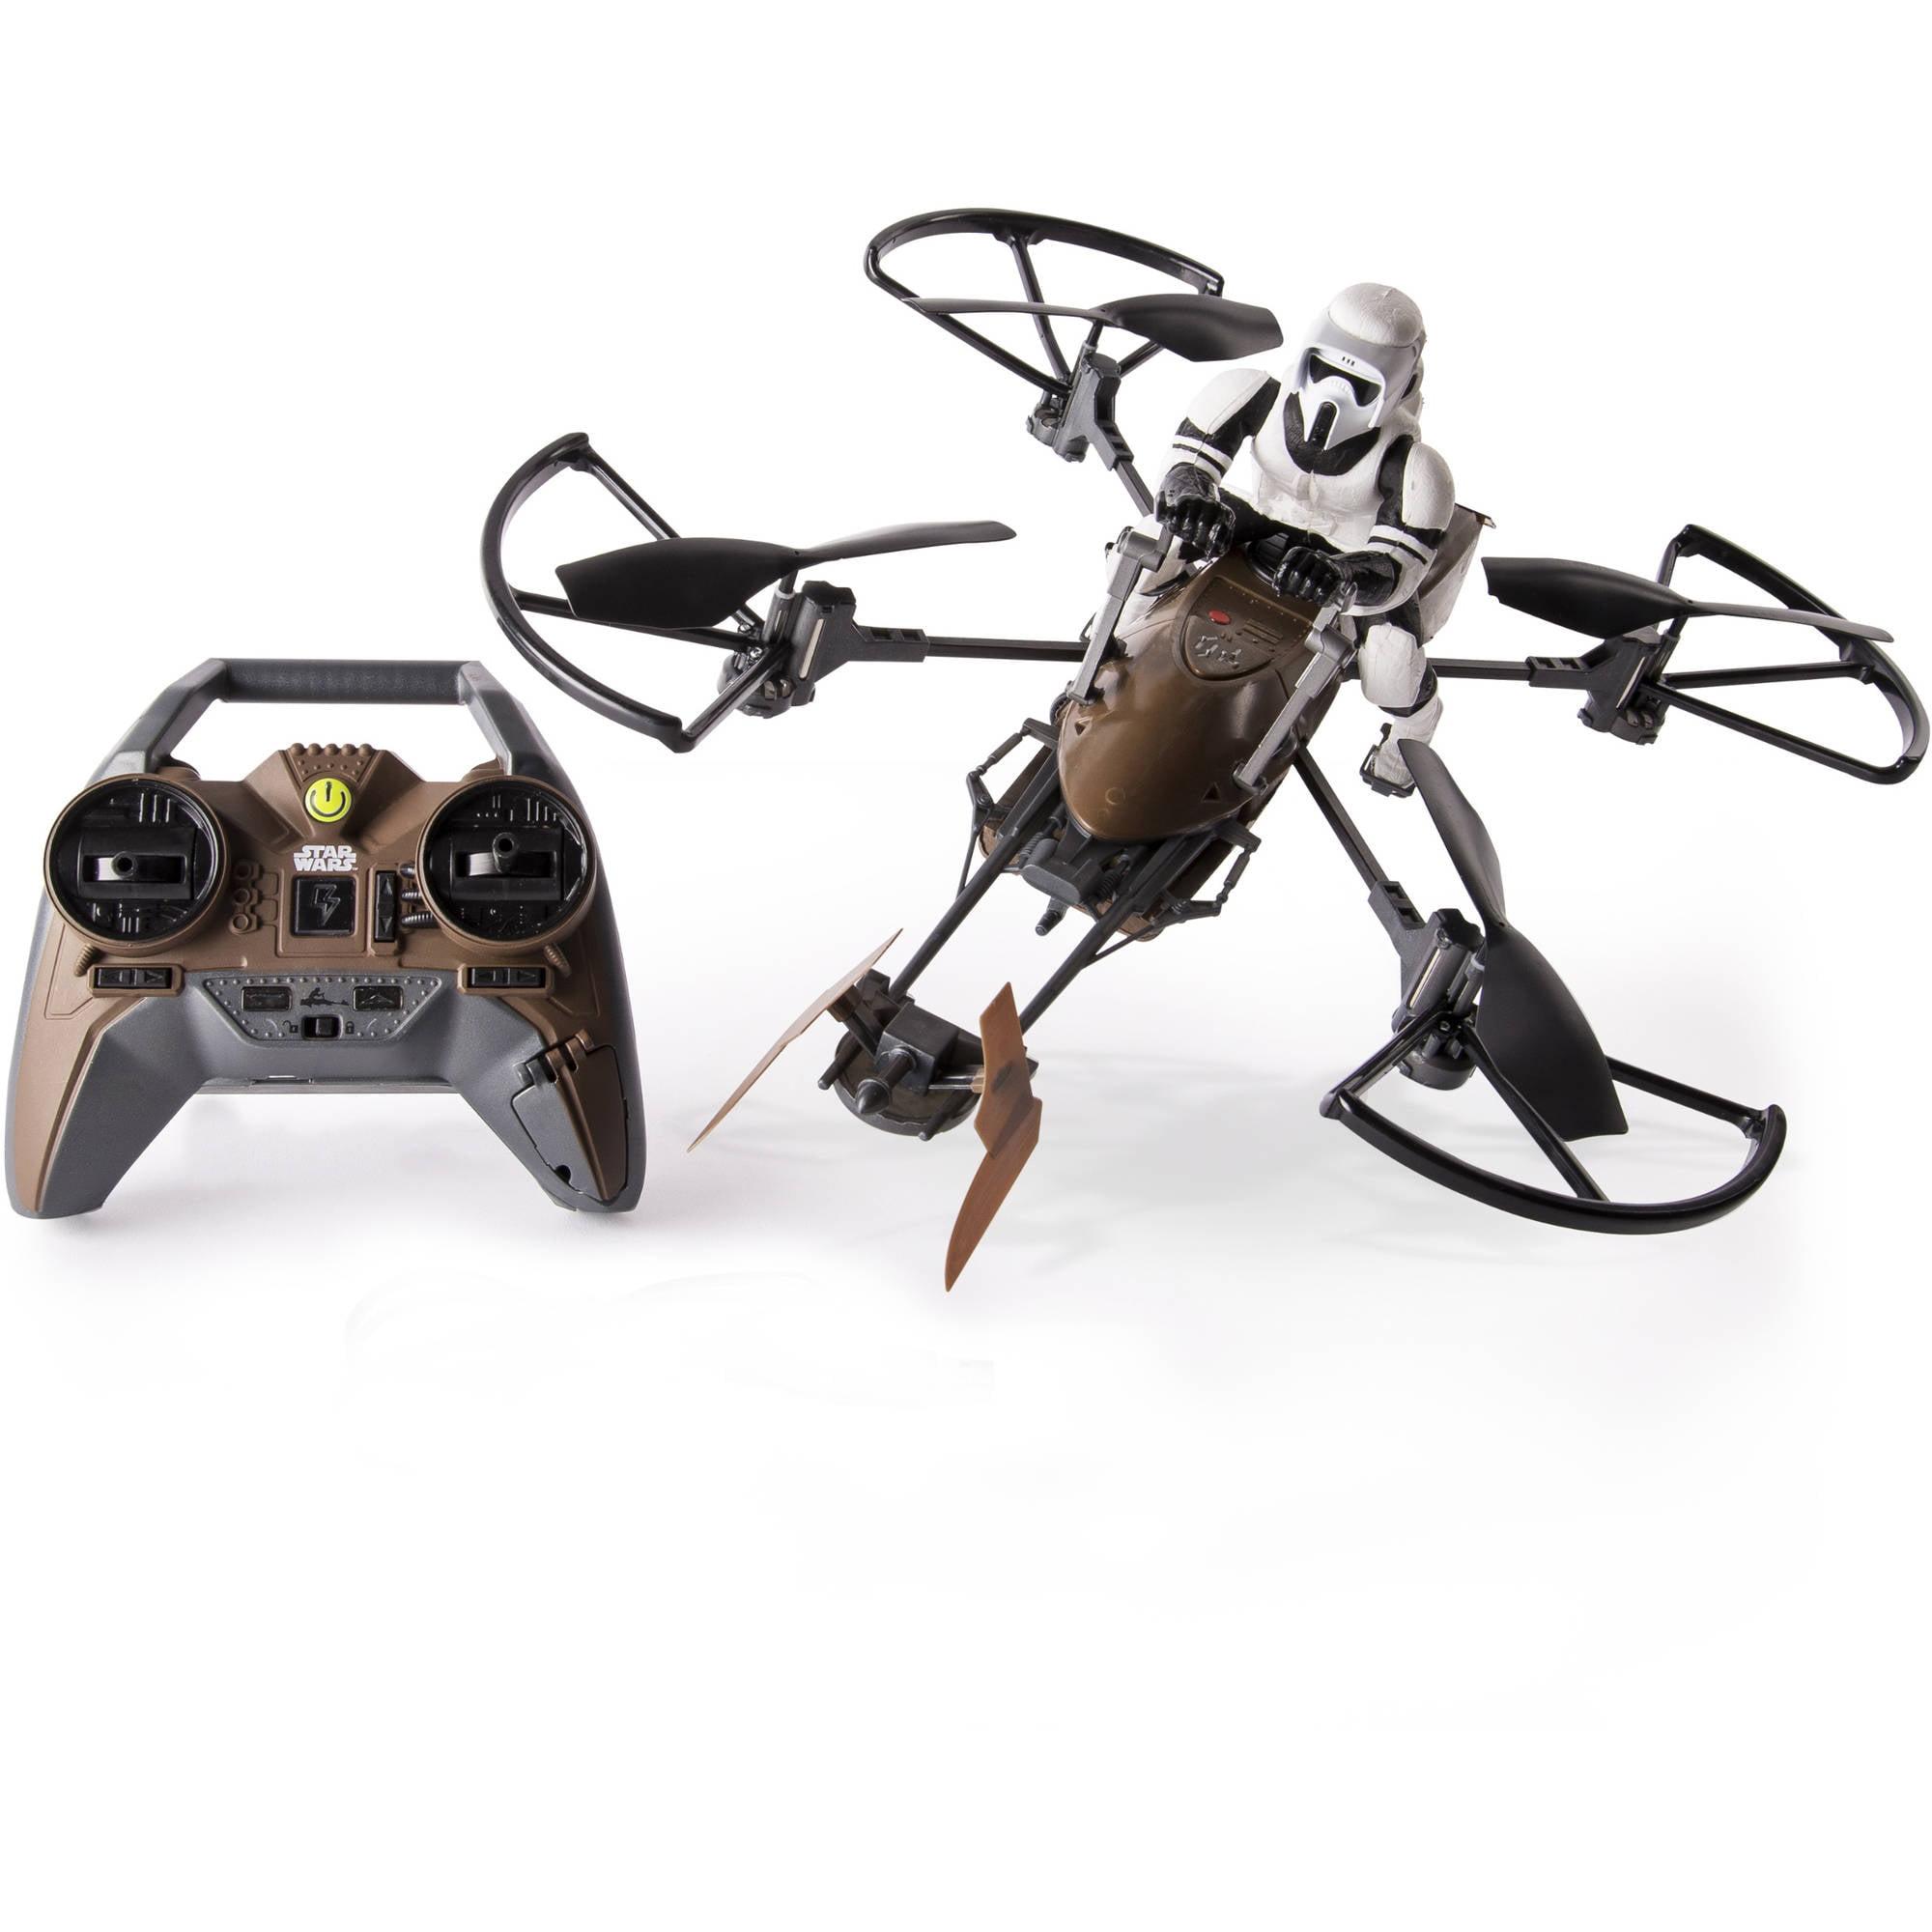 Air Hogs Star Wars, Rogue One Speeder Bike Remote Controlled Drone